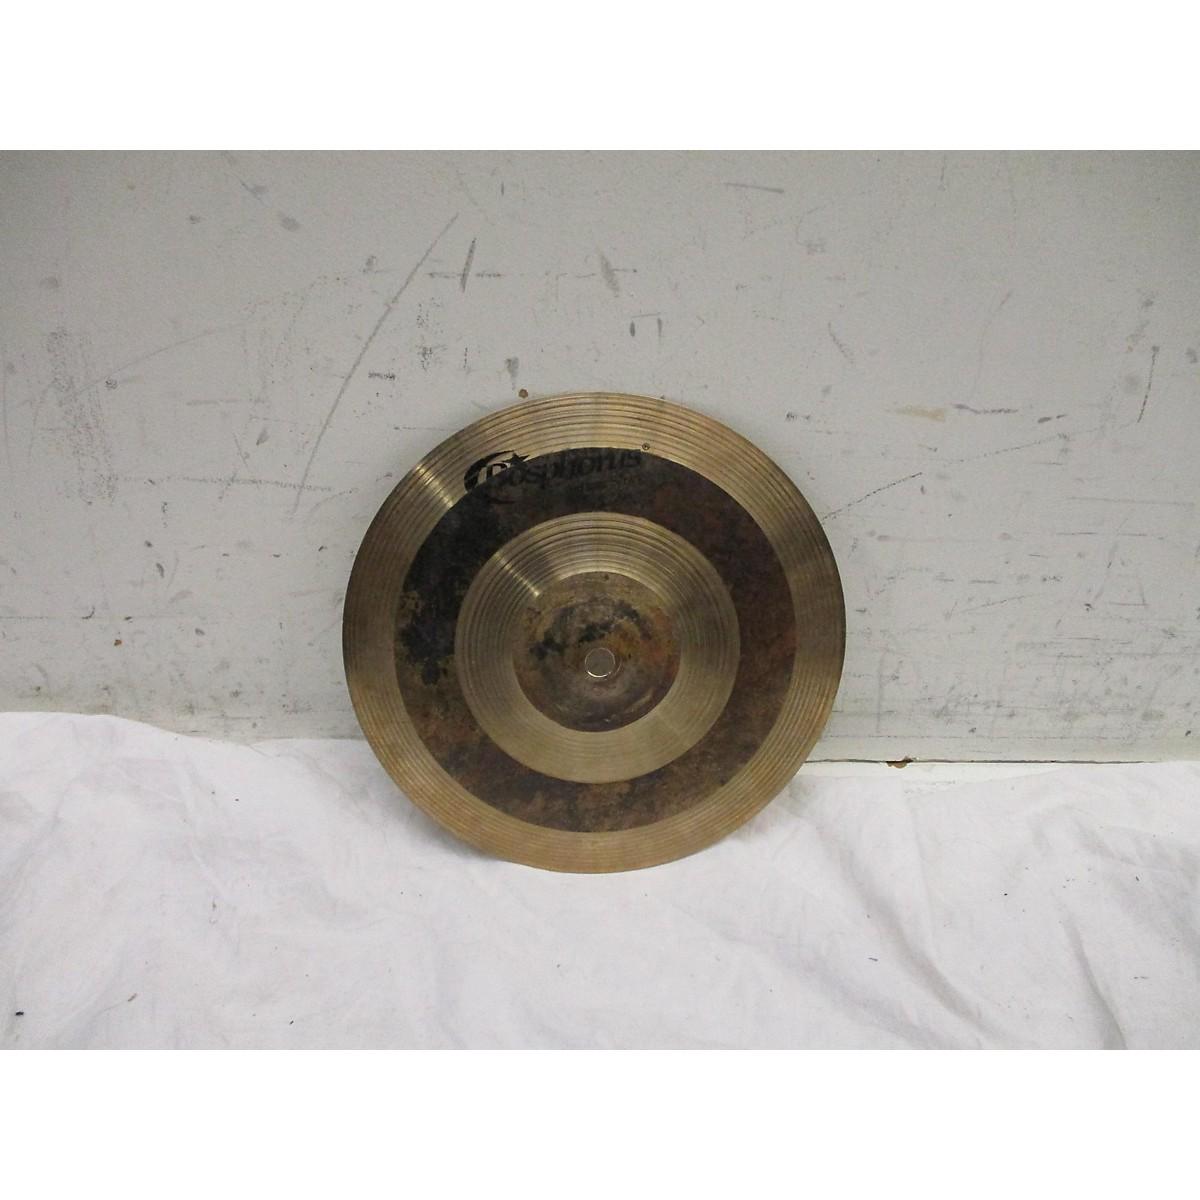 Bosphorus Cymbals 9in Antique Series 9